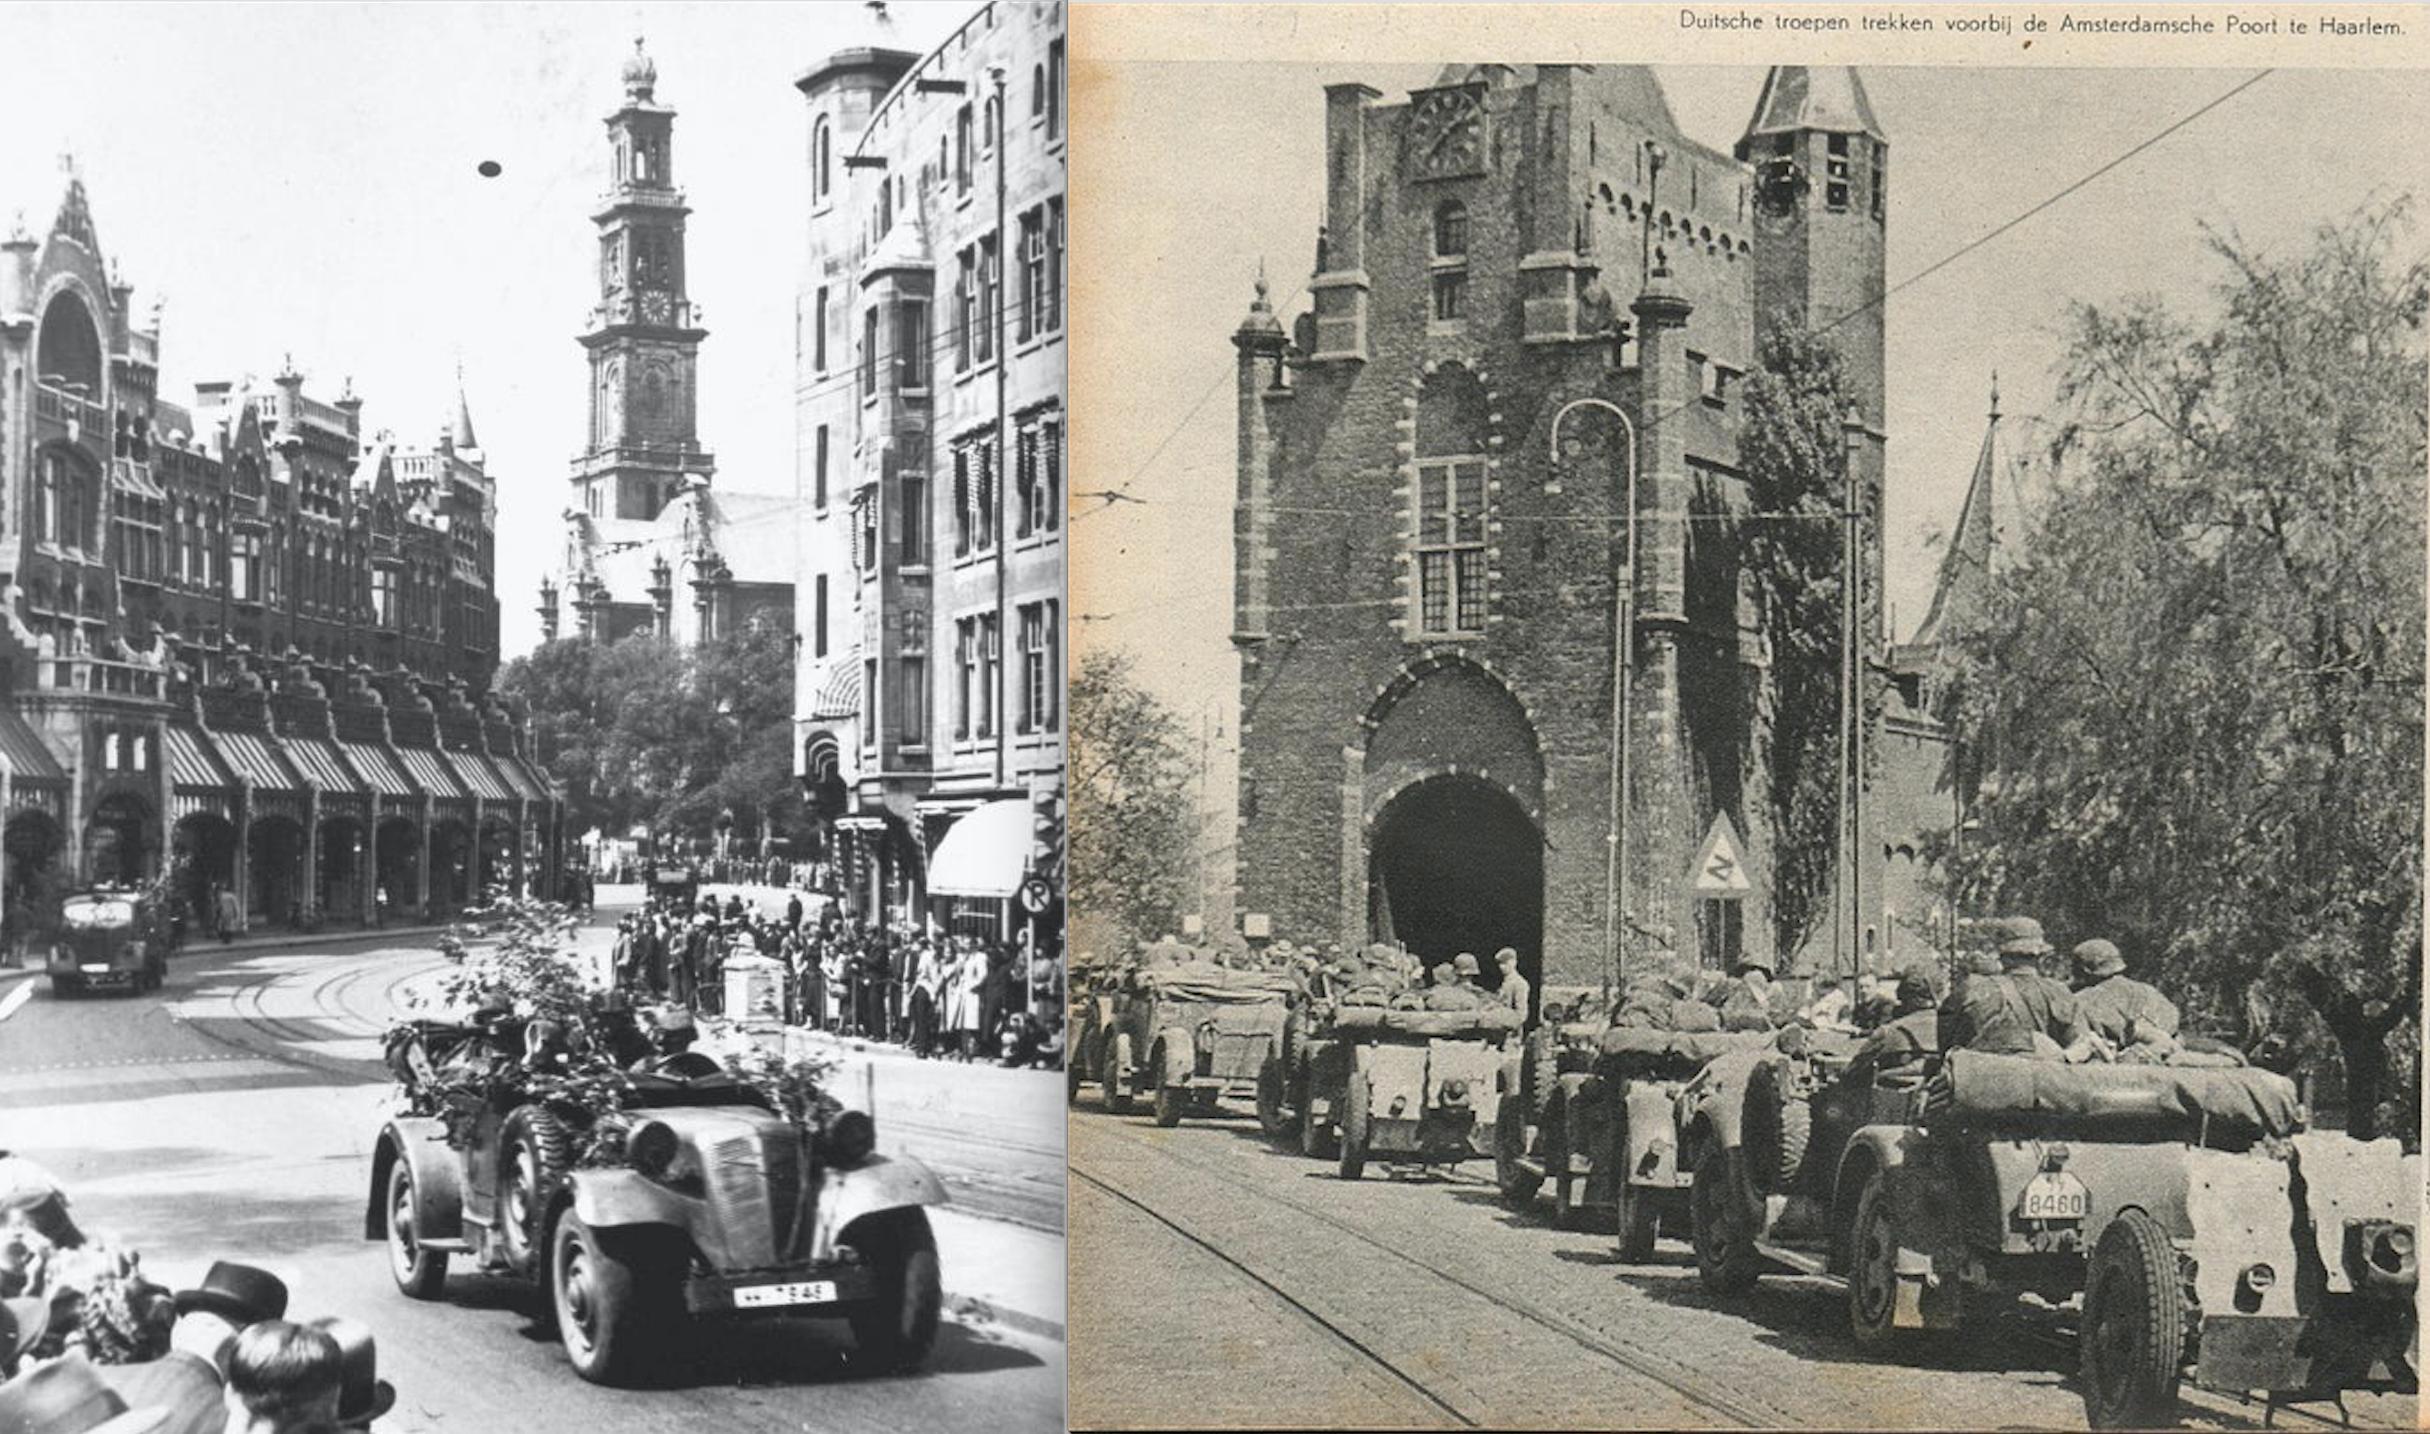 Adler 3Gd Wanderer W11 Netherlands Amsterdam Raadhuisstraat Haarlem 14 May 1940